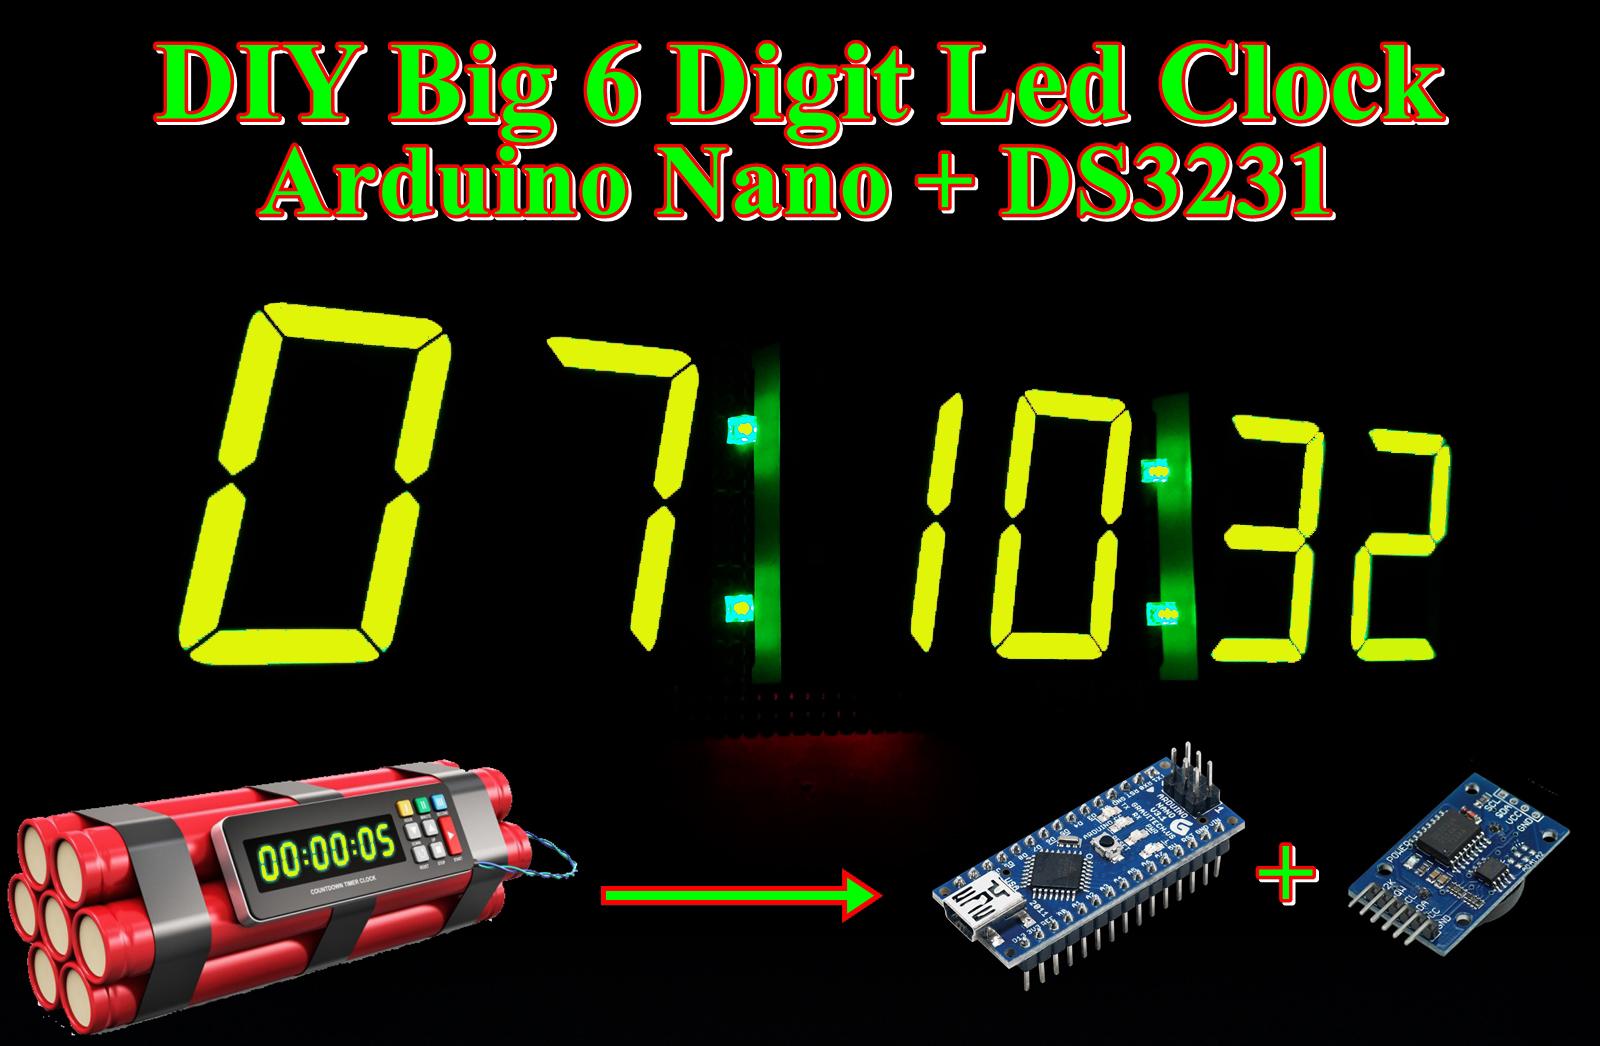 DIY Big 6 Digit Led Clock Arduino + RTC DS3231 - Dicky B Mz 161f38398f